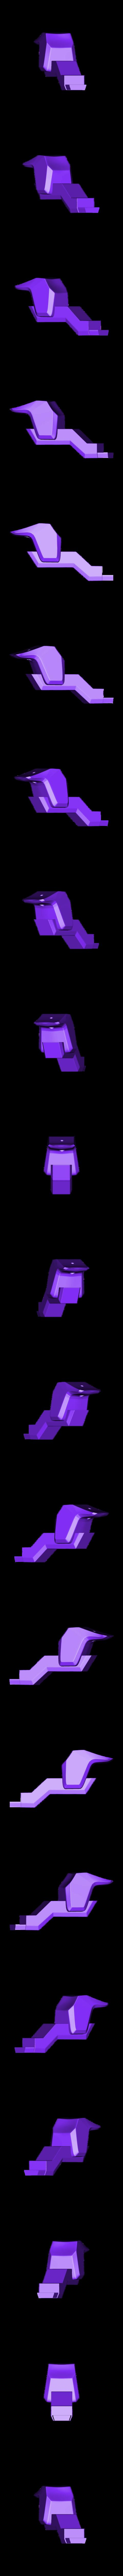 Lucio_support.stl Download free STL file Overwatch Lucio Blaster • 3D printer object, Adafruit